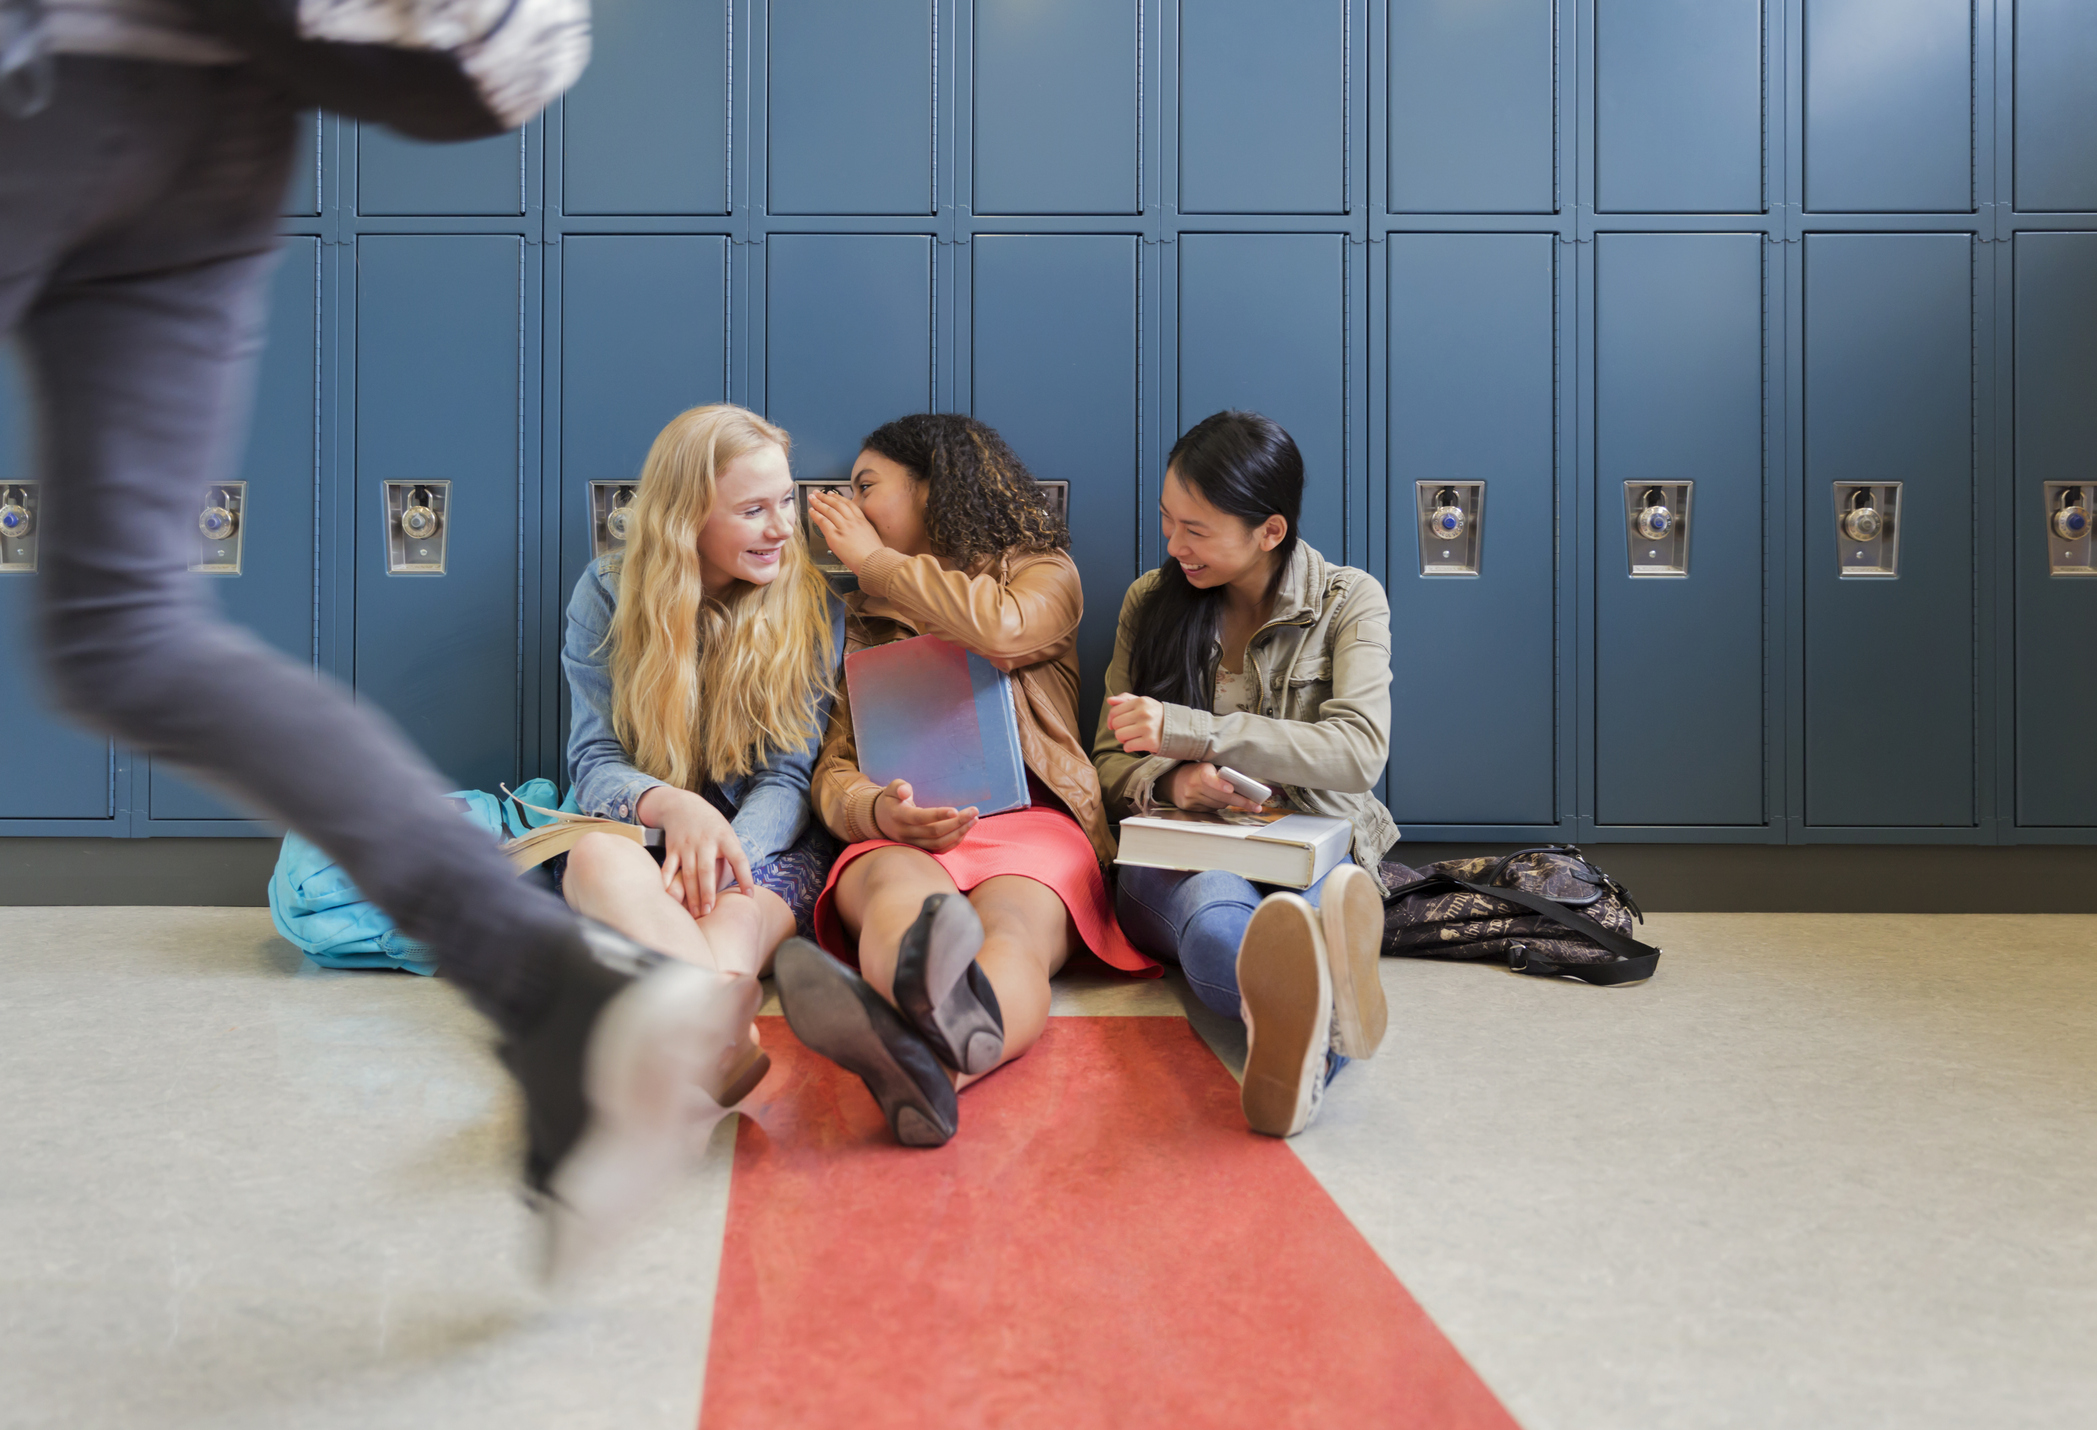 Students gossiping in school hallway.